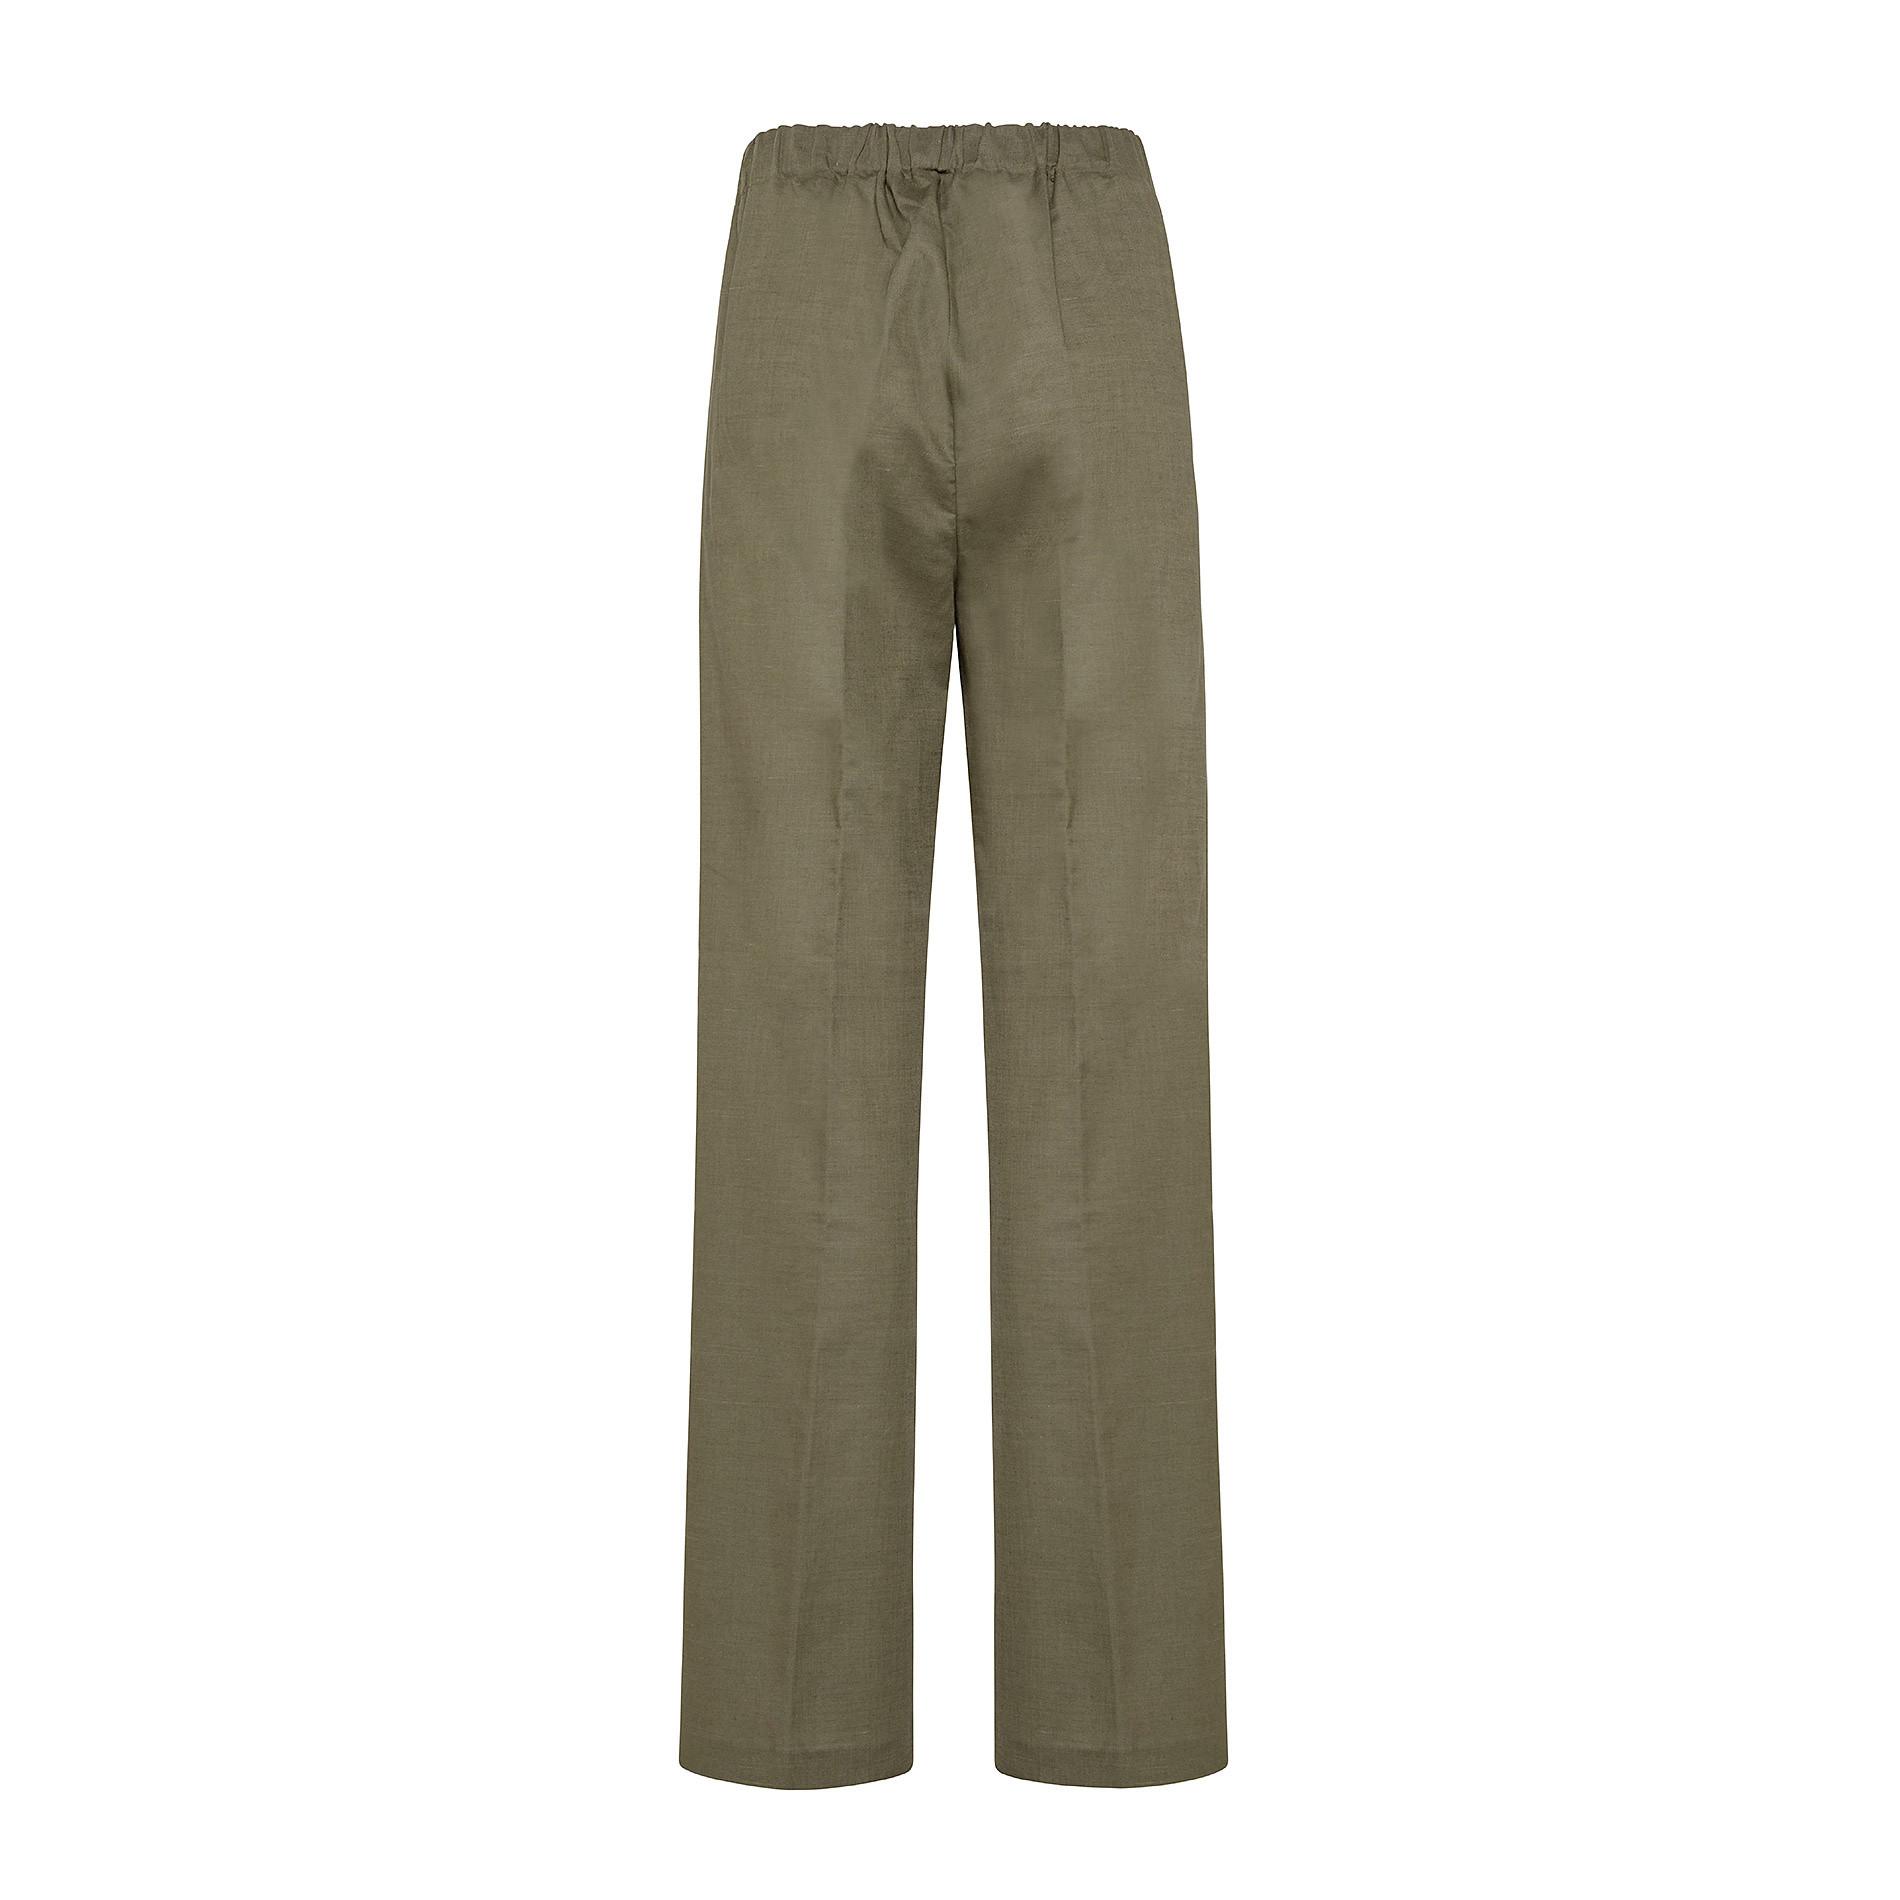 Pantalone misto lino con elastico Koan, Verde scuro, large image number 1